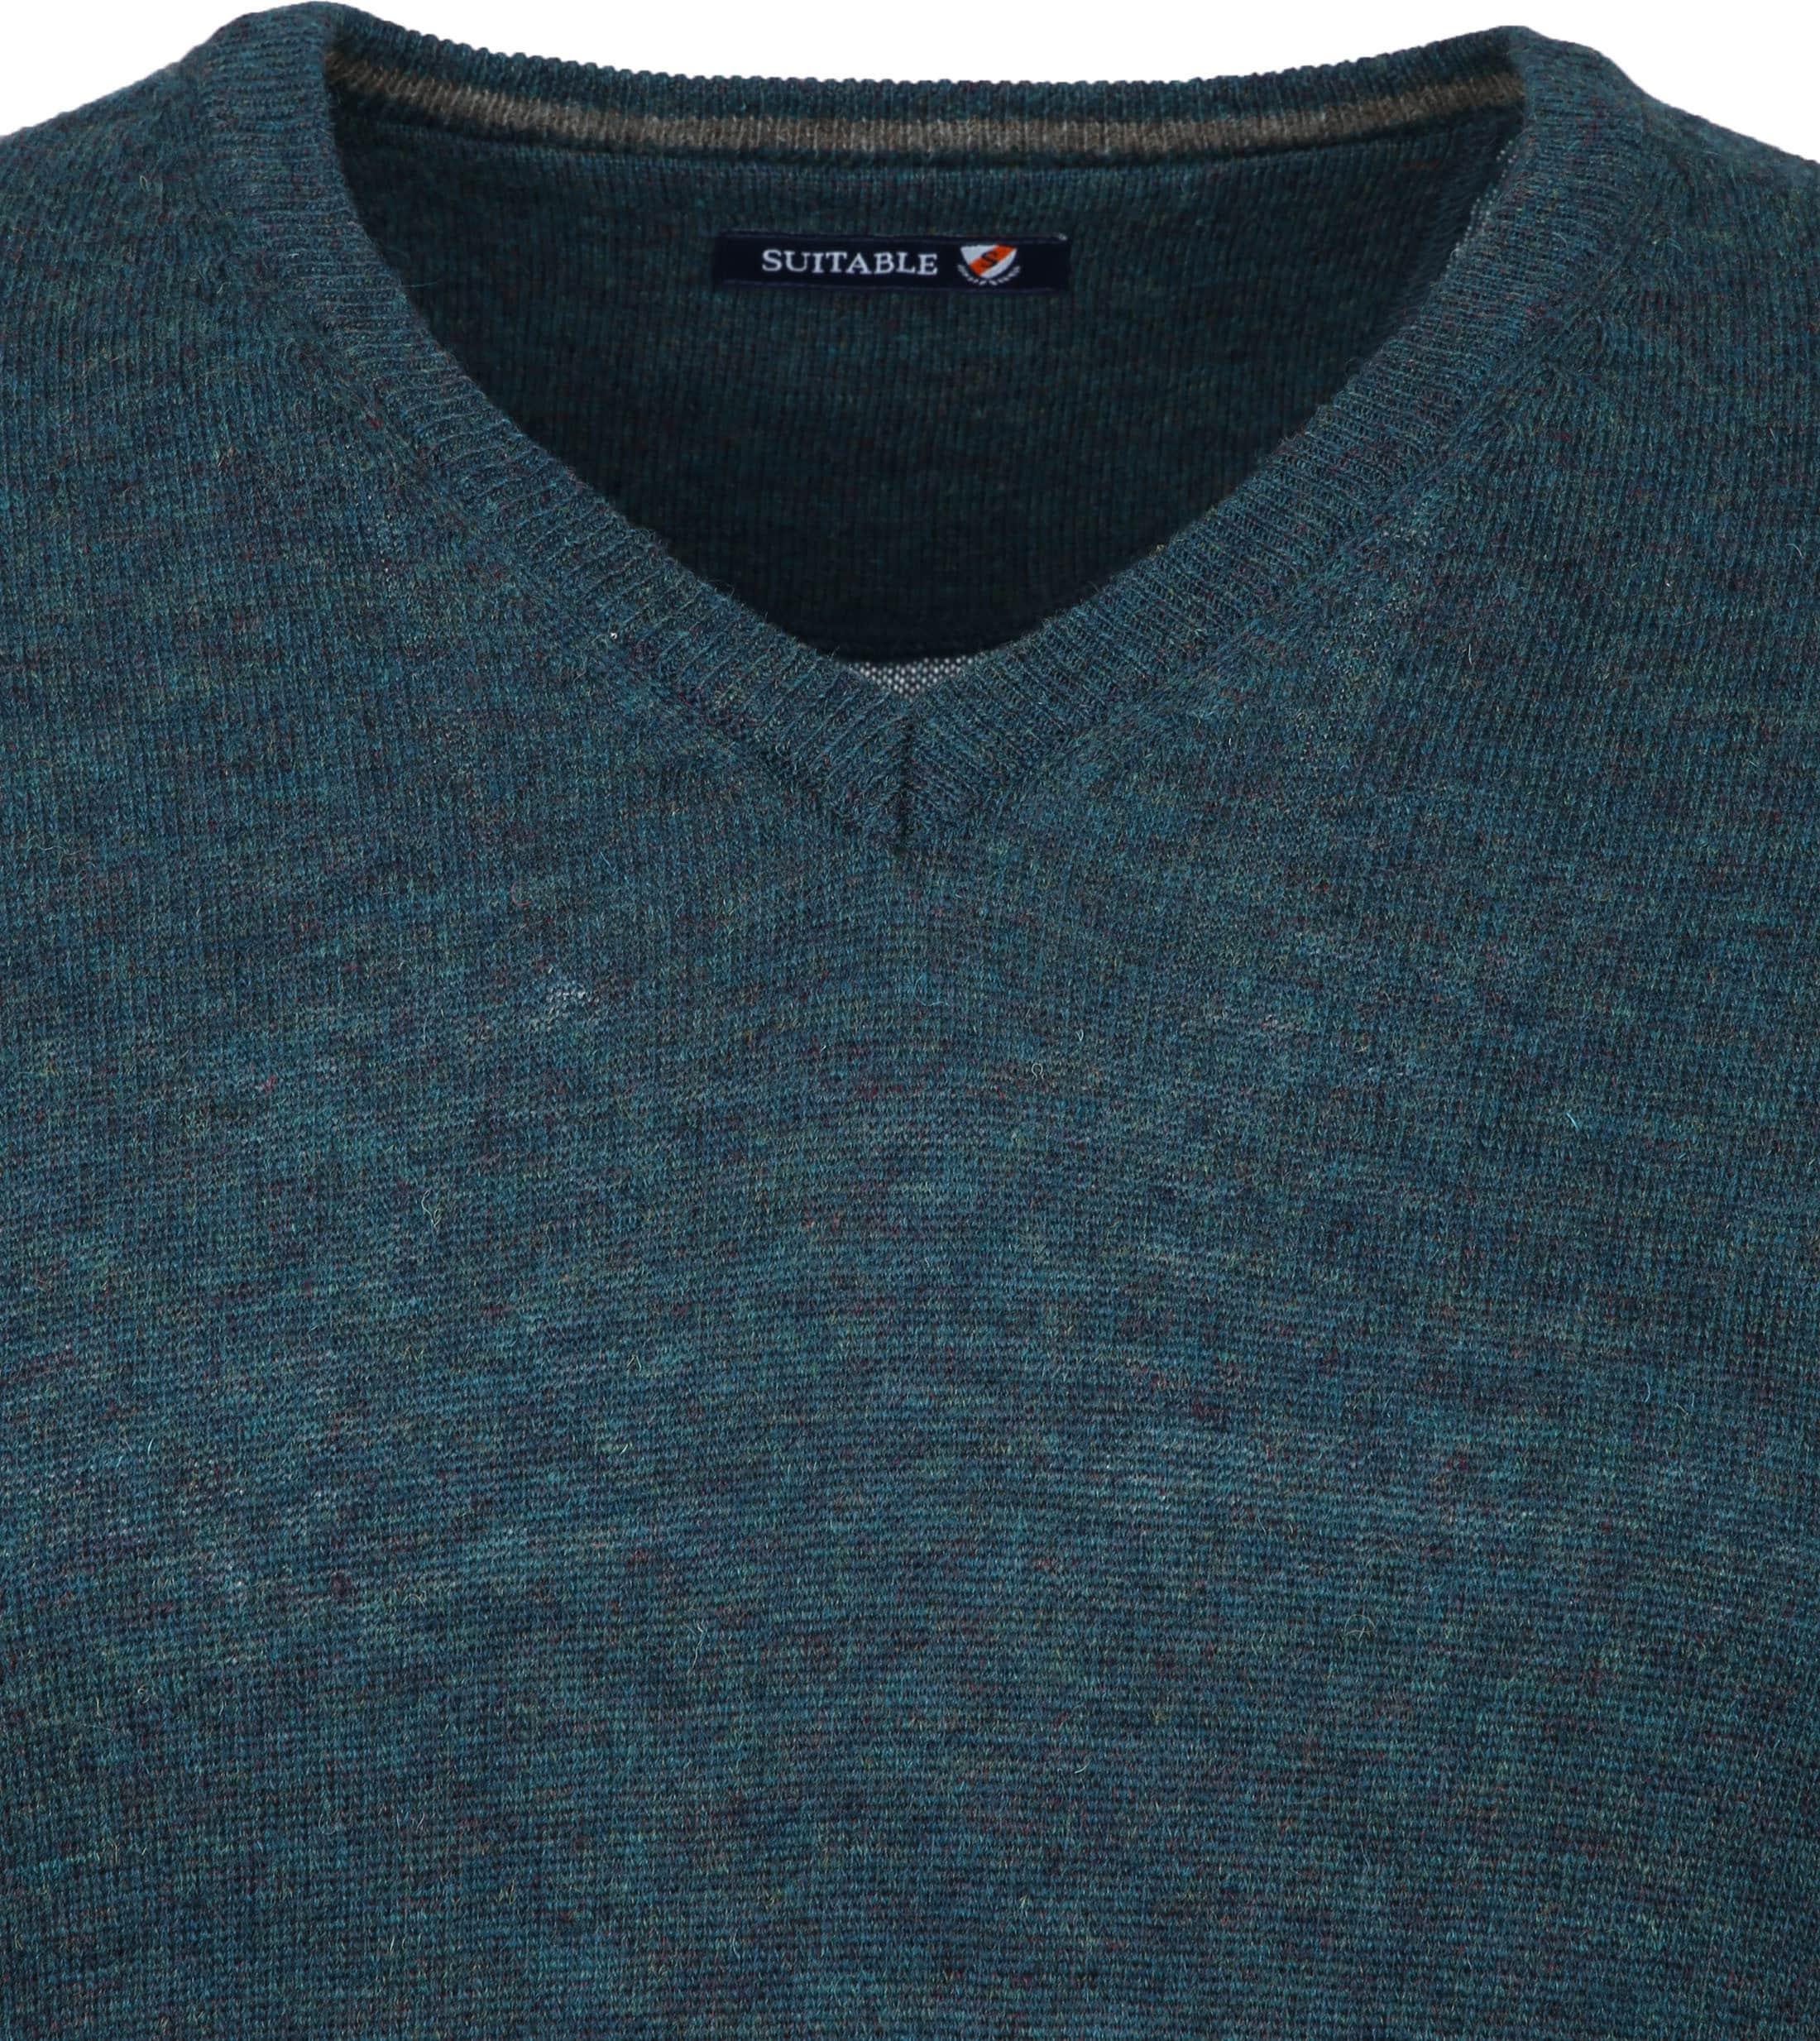 Suitable Pullover V-Hals Lamswol Groen foto 2